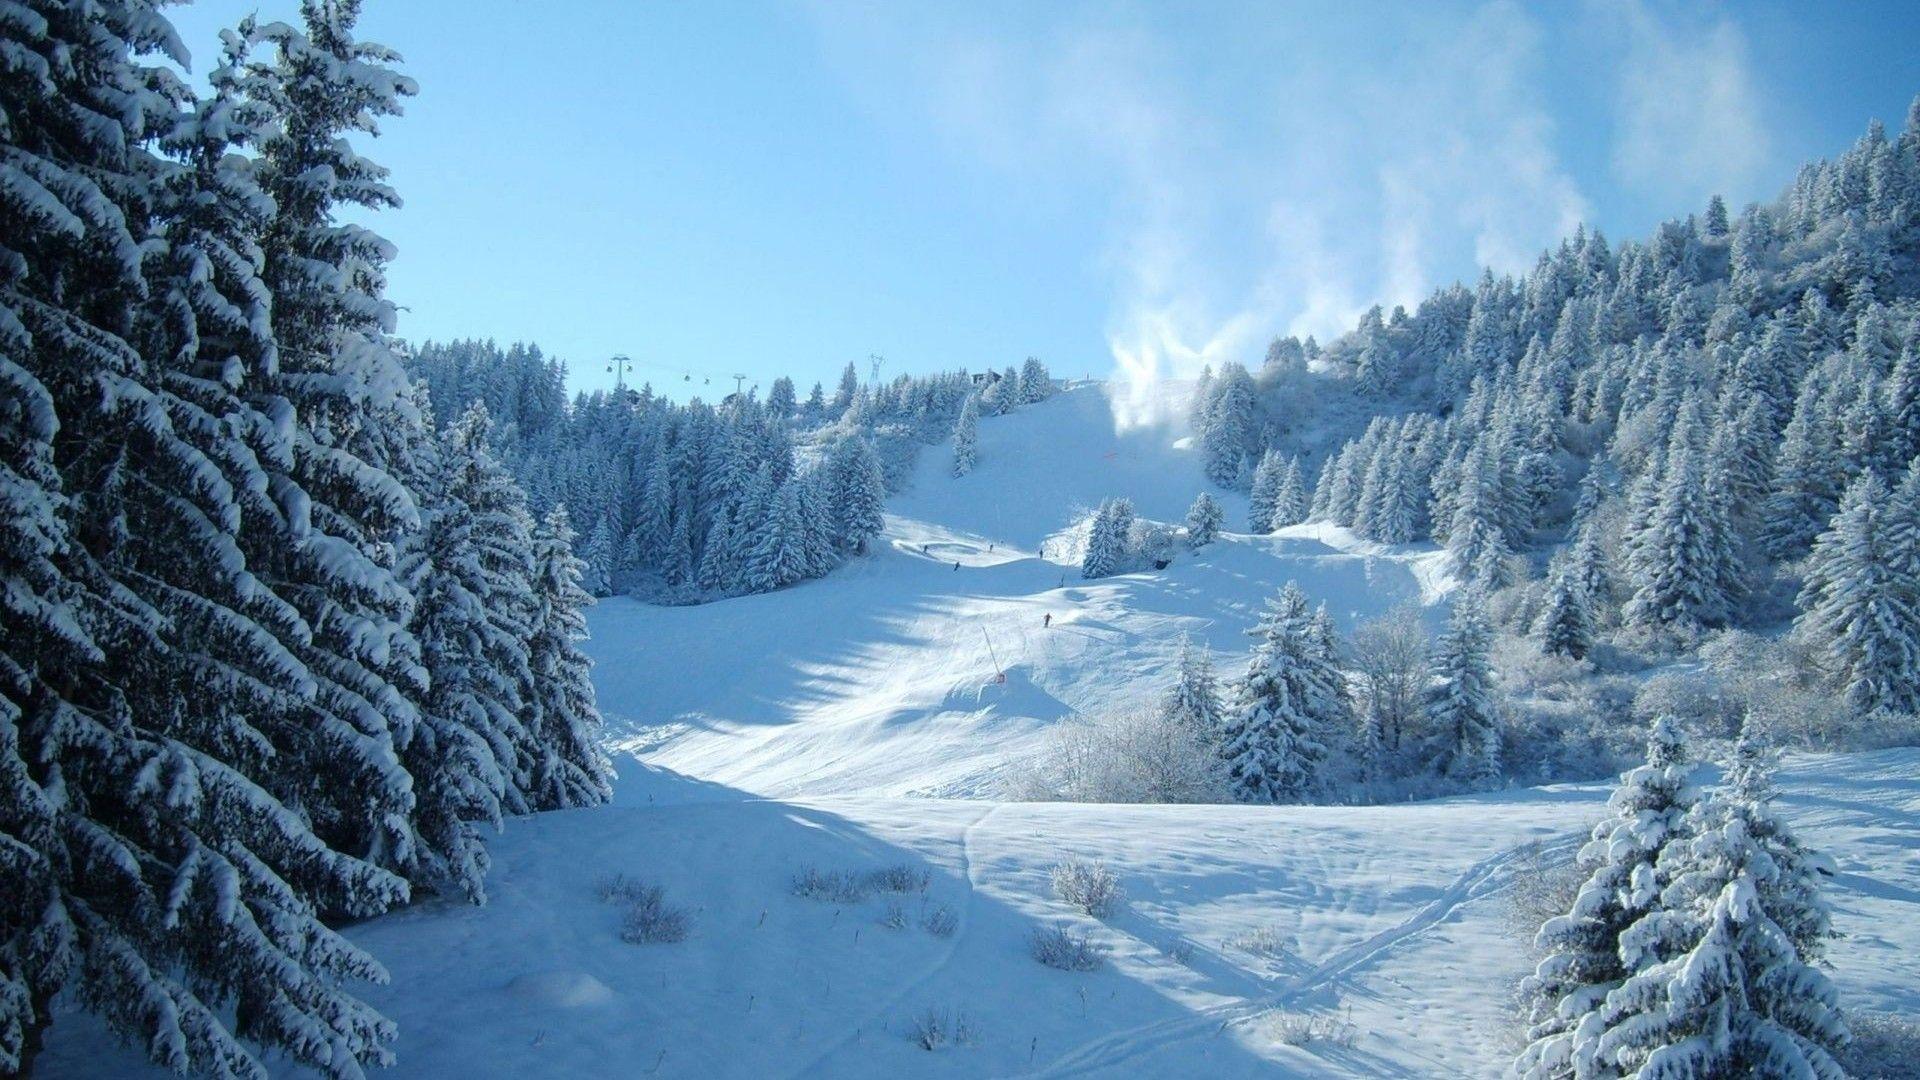 Snowy Mountain Winter Wallpaper HD1920 1080 Beautiful